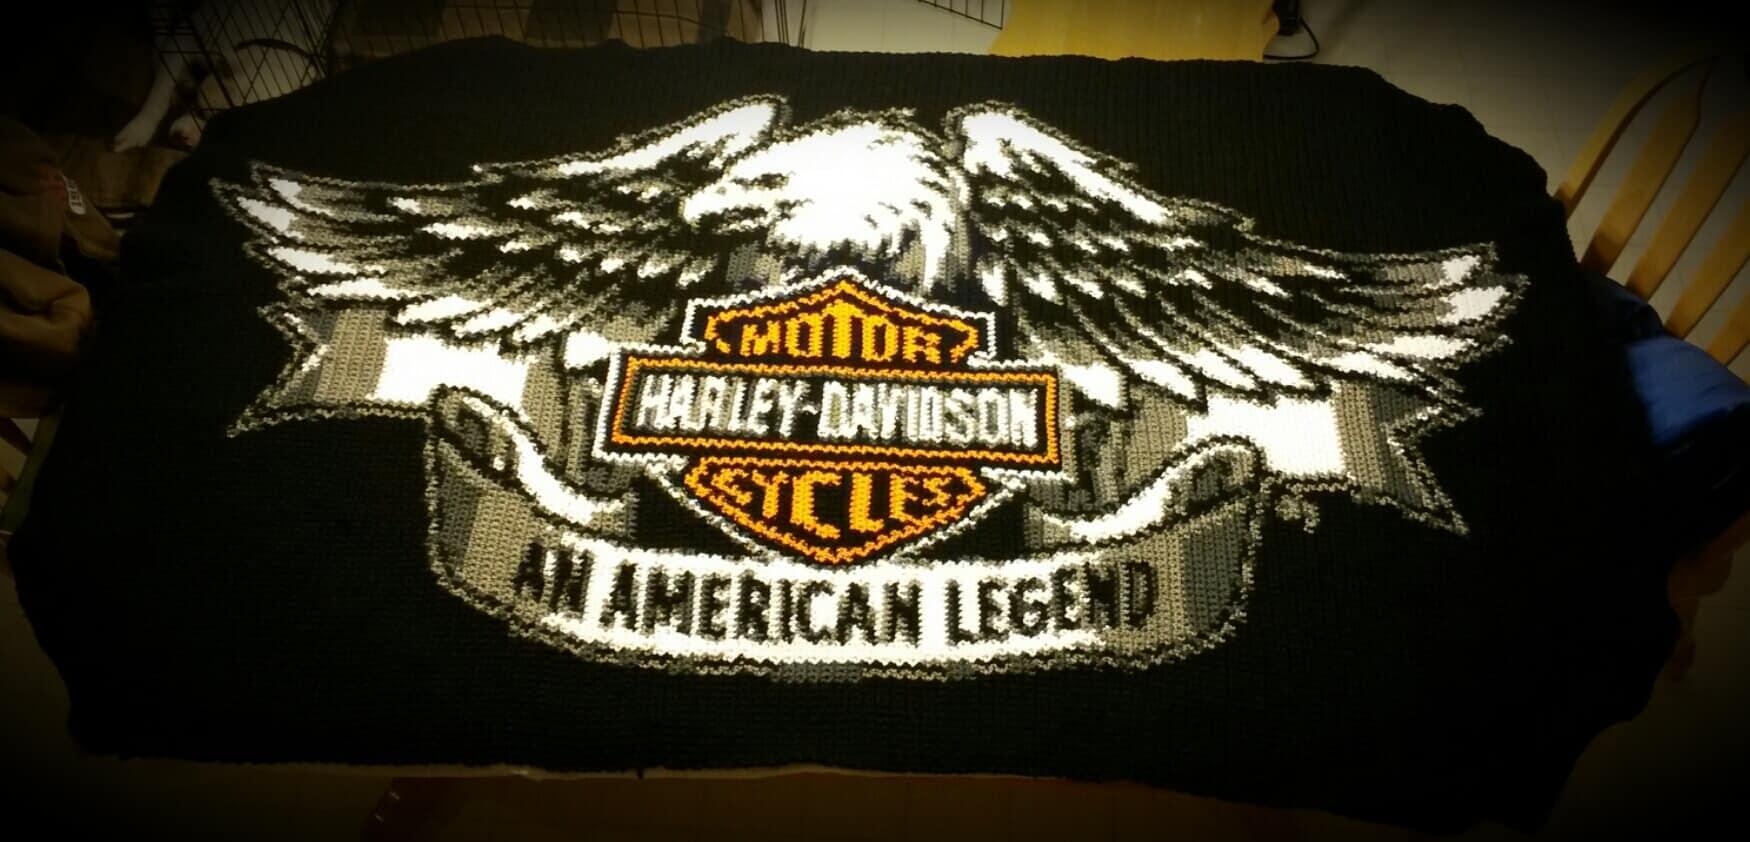 Harley Davidson – An American Legend